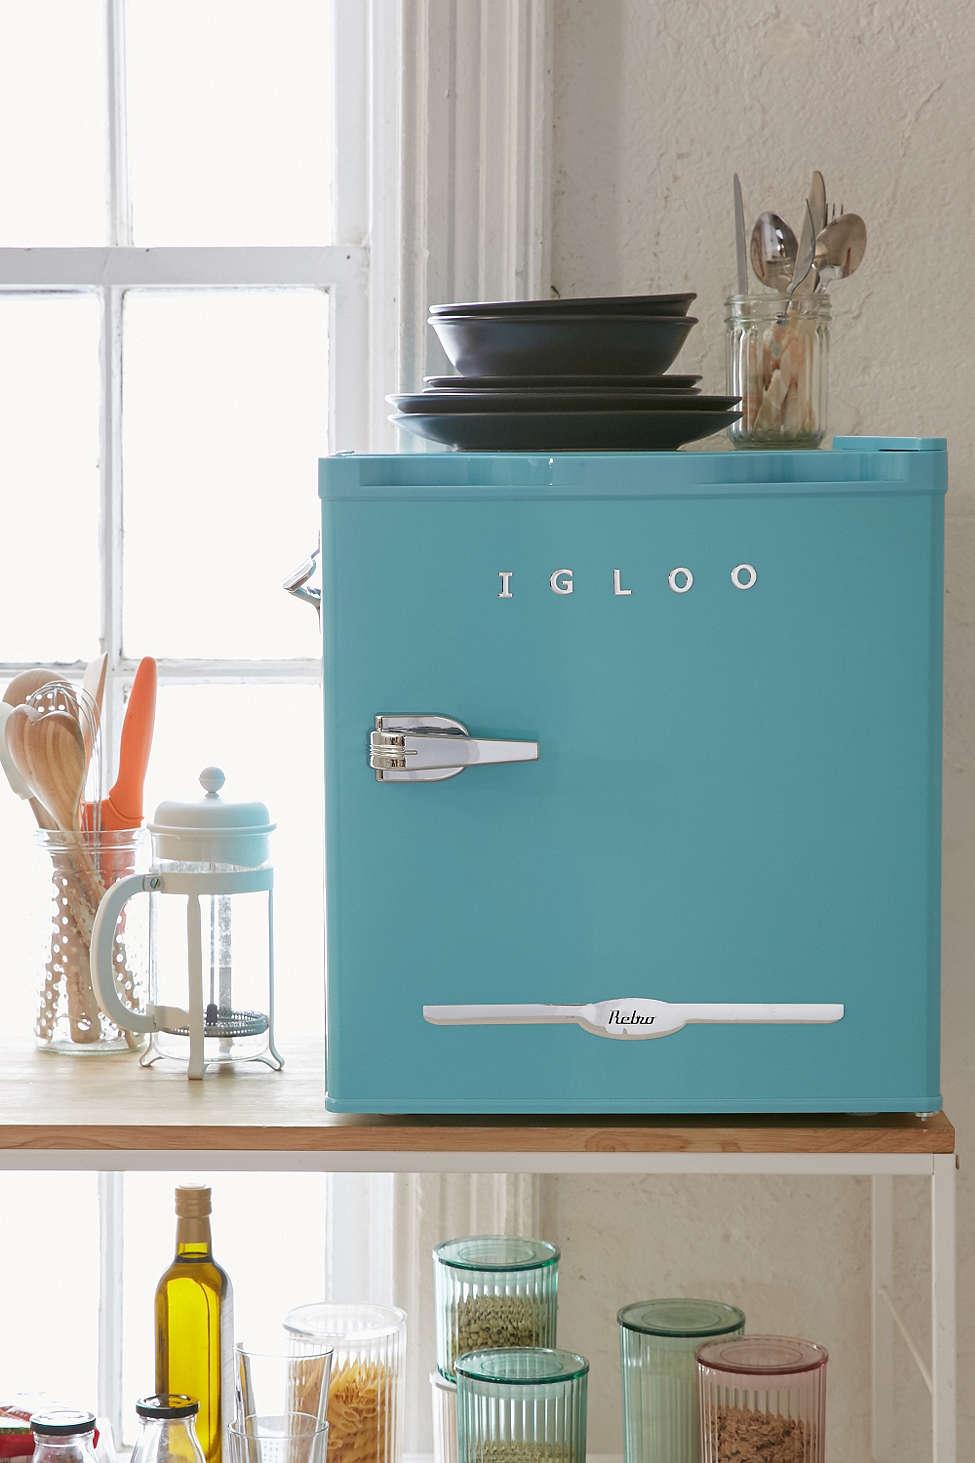 Sky Igloo Mini Refrigerator Everything Turquoise